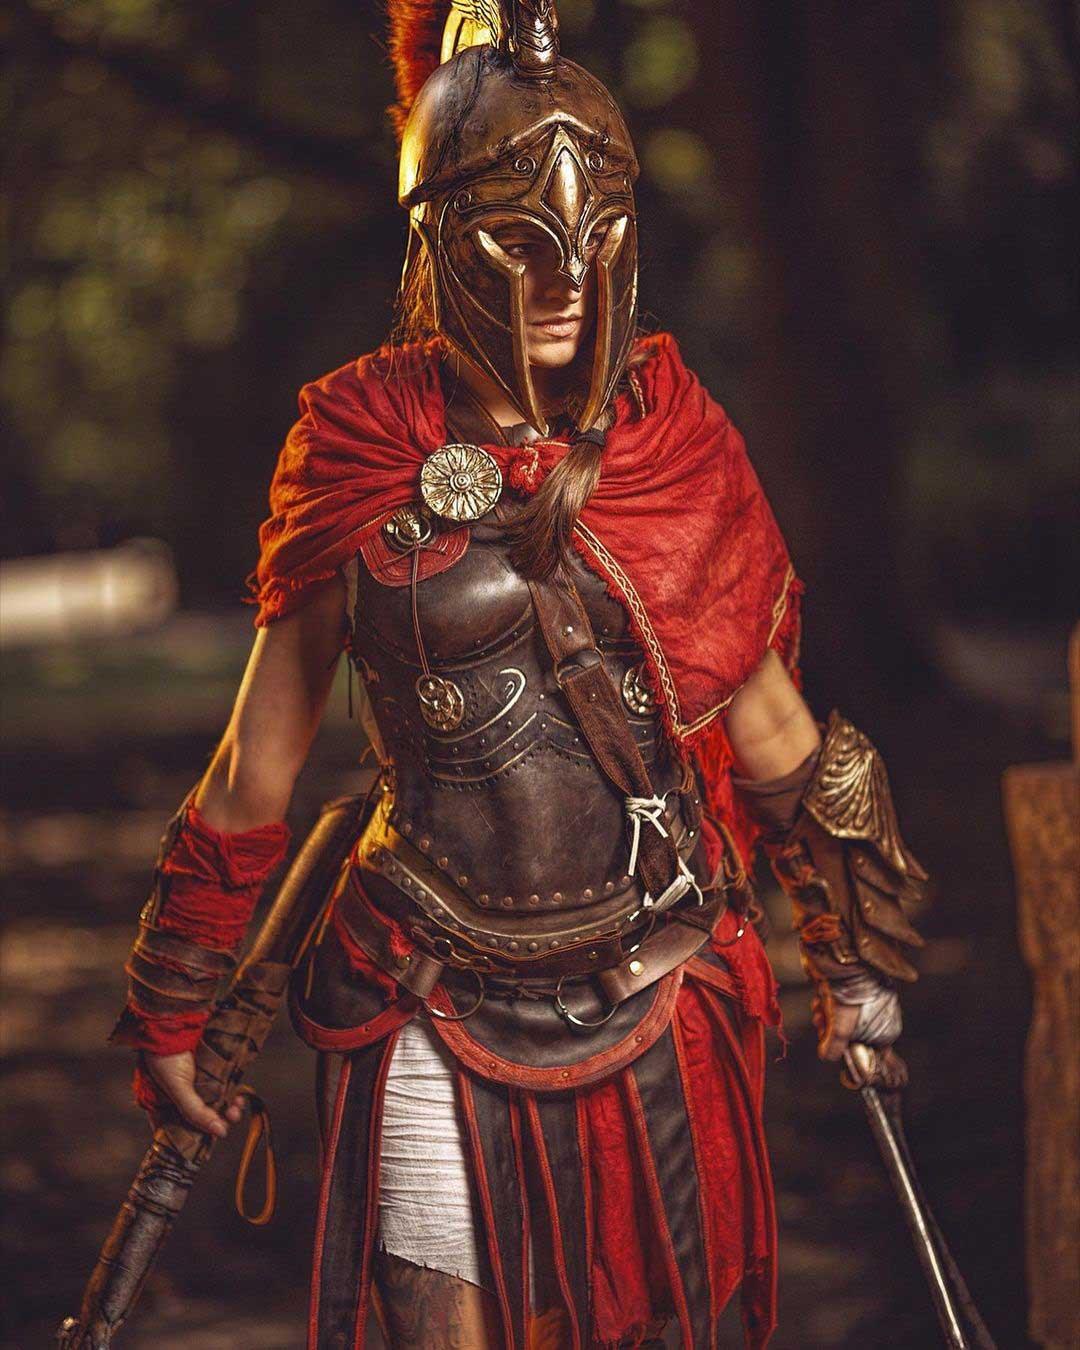 cosplay da Kassandra de Assassin's Creed Odyssey